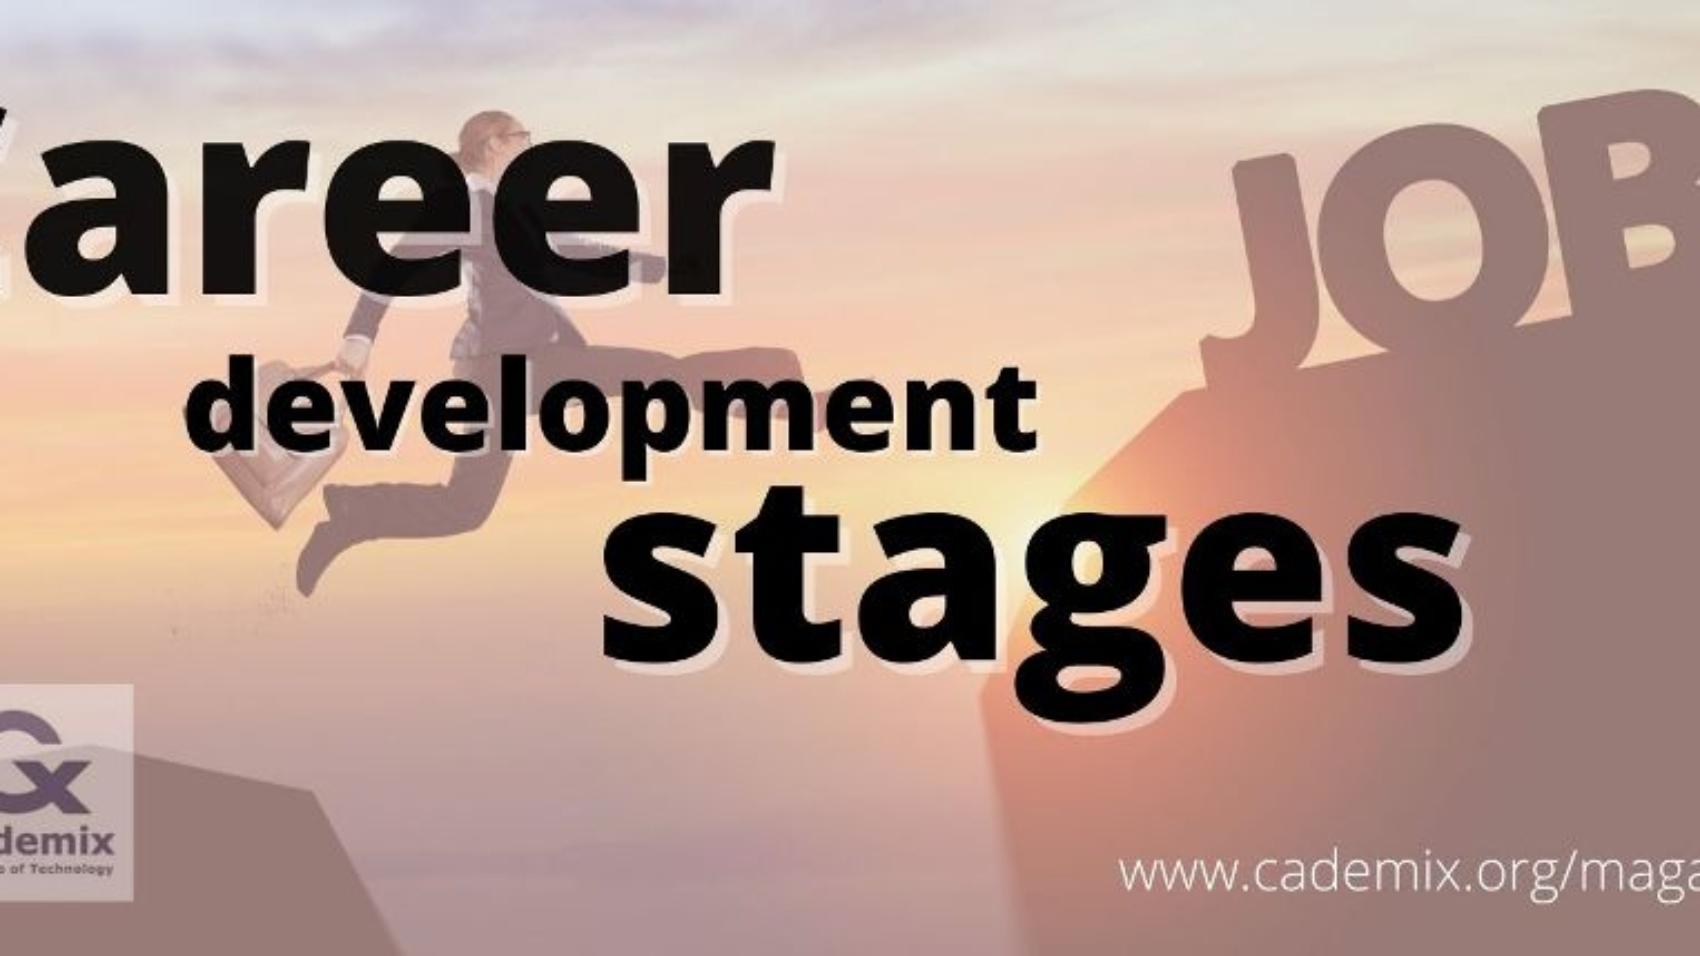 career development stages cademix article Lindah